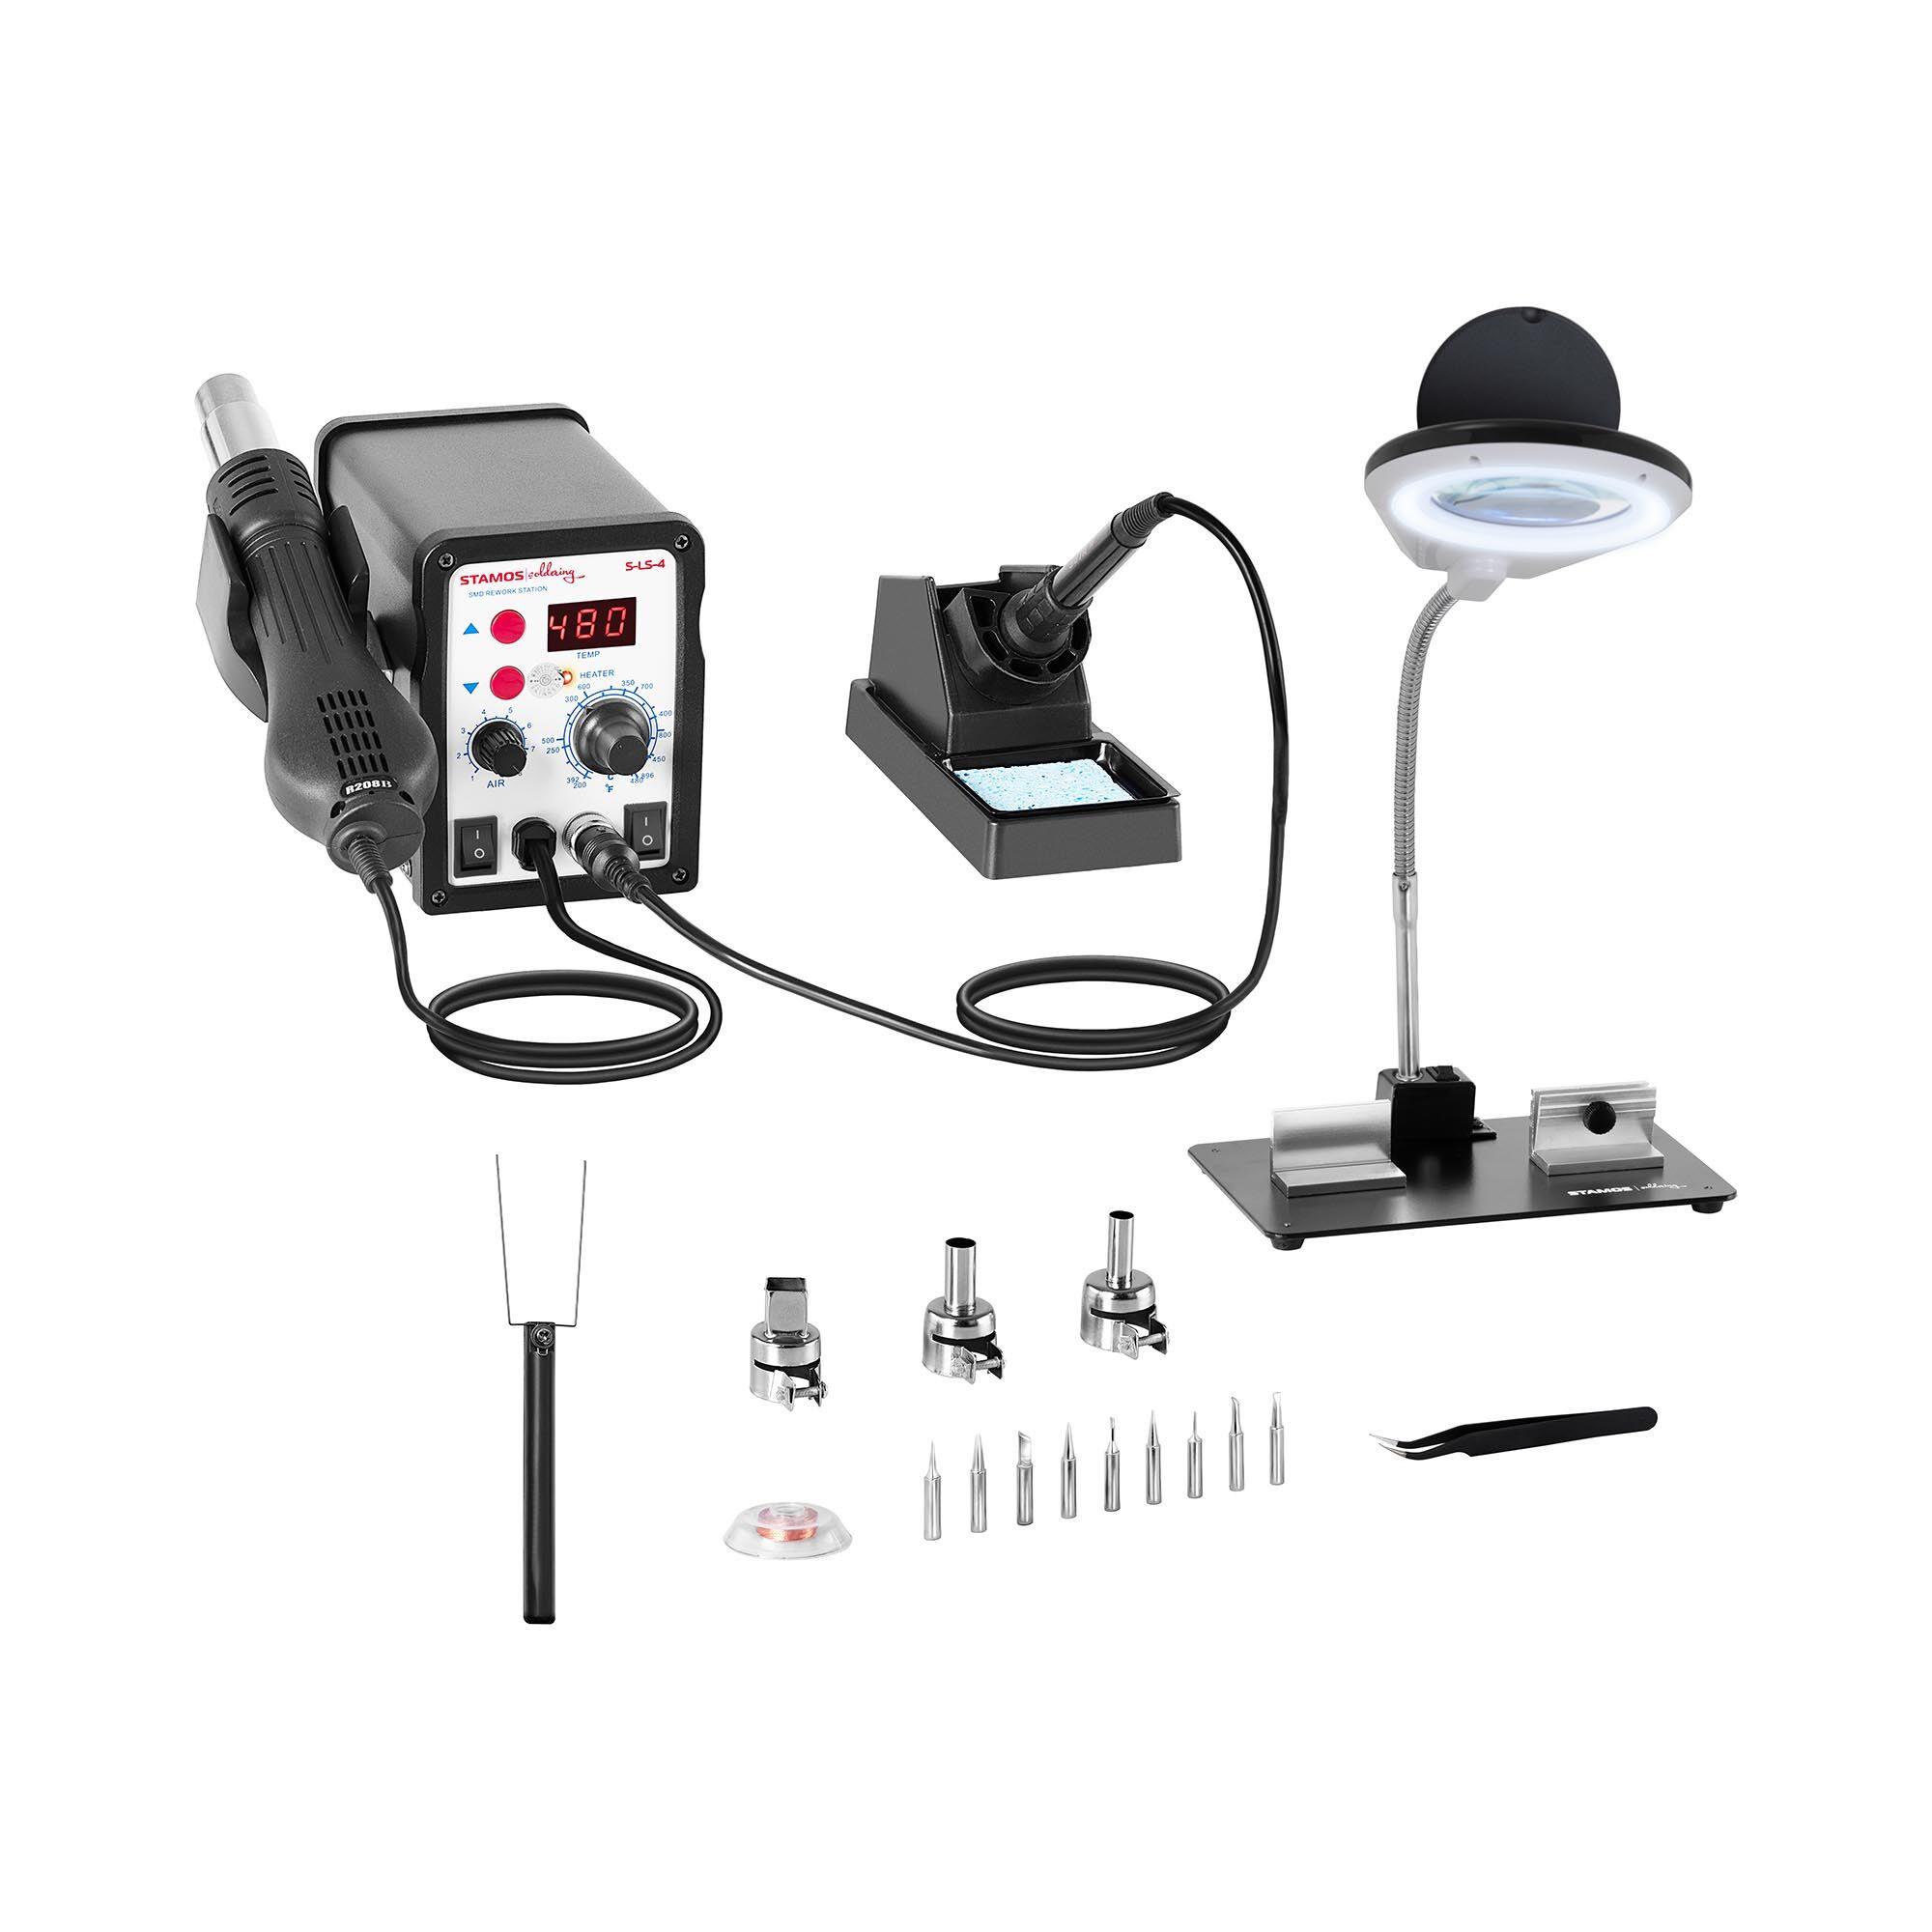 Stamos Soldering Set Soldering Station - 60 Watt - LED Display + Accessoires